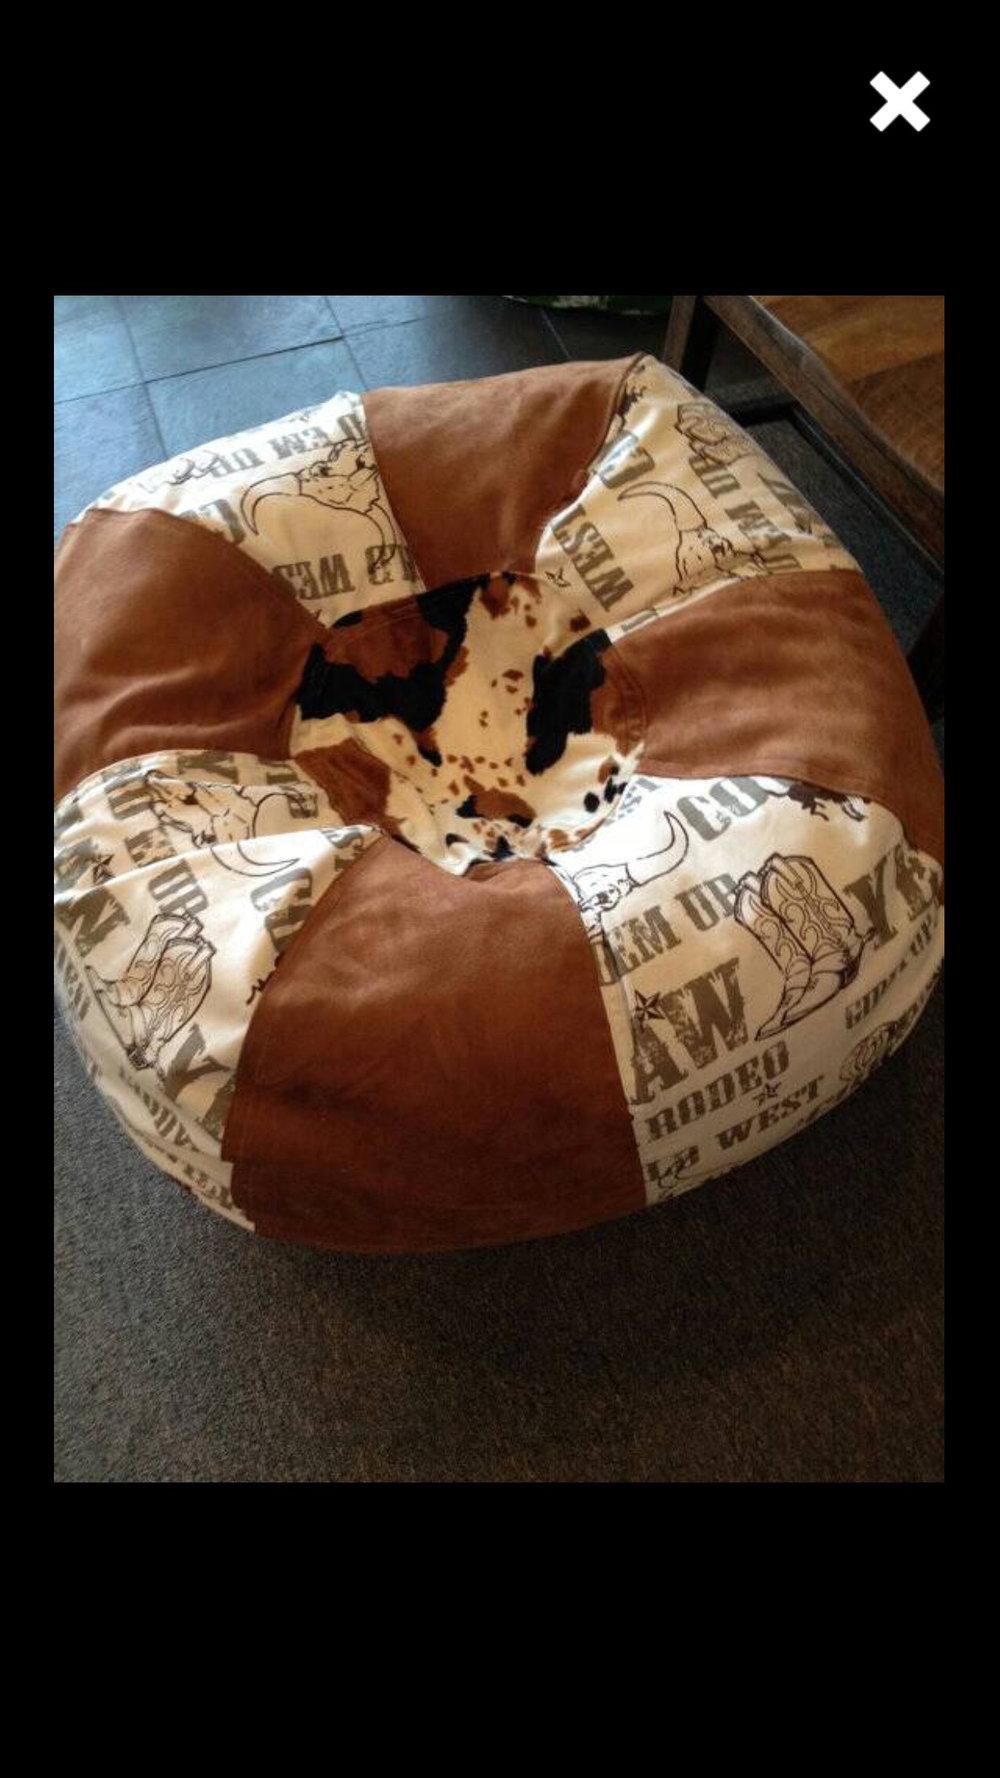 custom-pillows-bedding-slipcovers-essex-connecticut-3.jpg